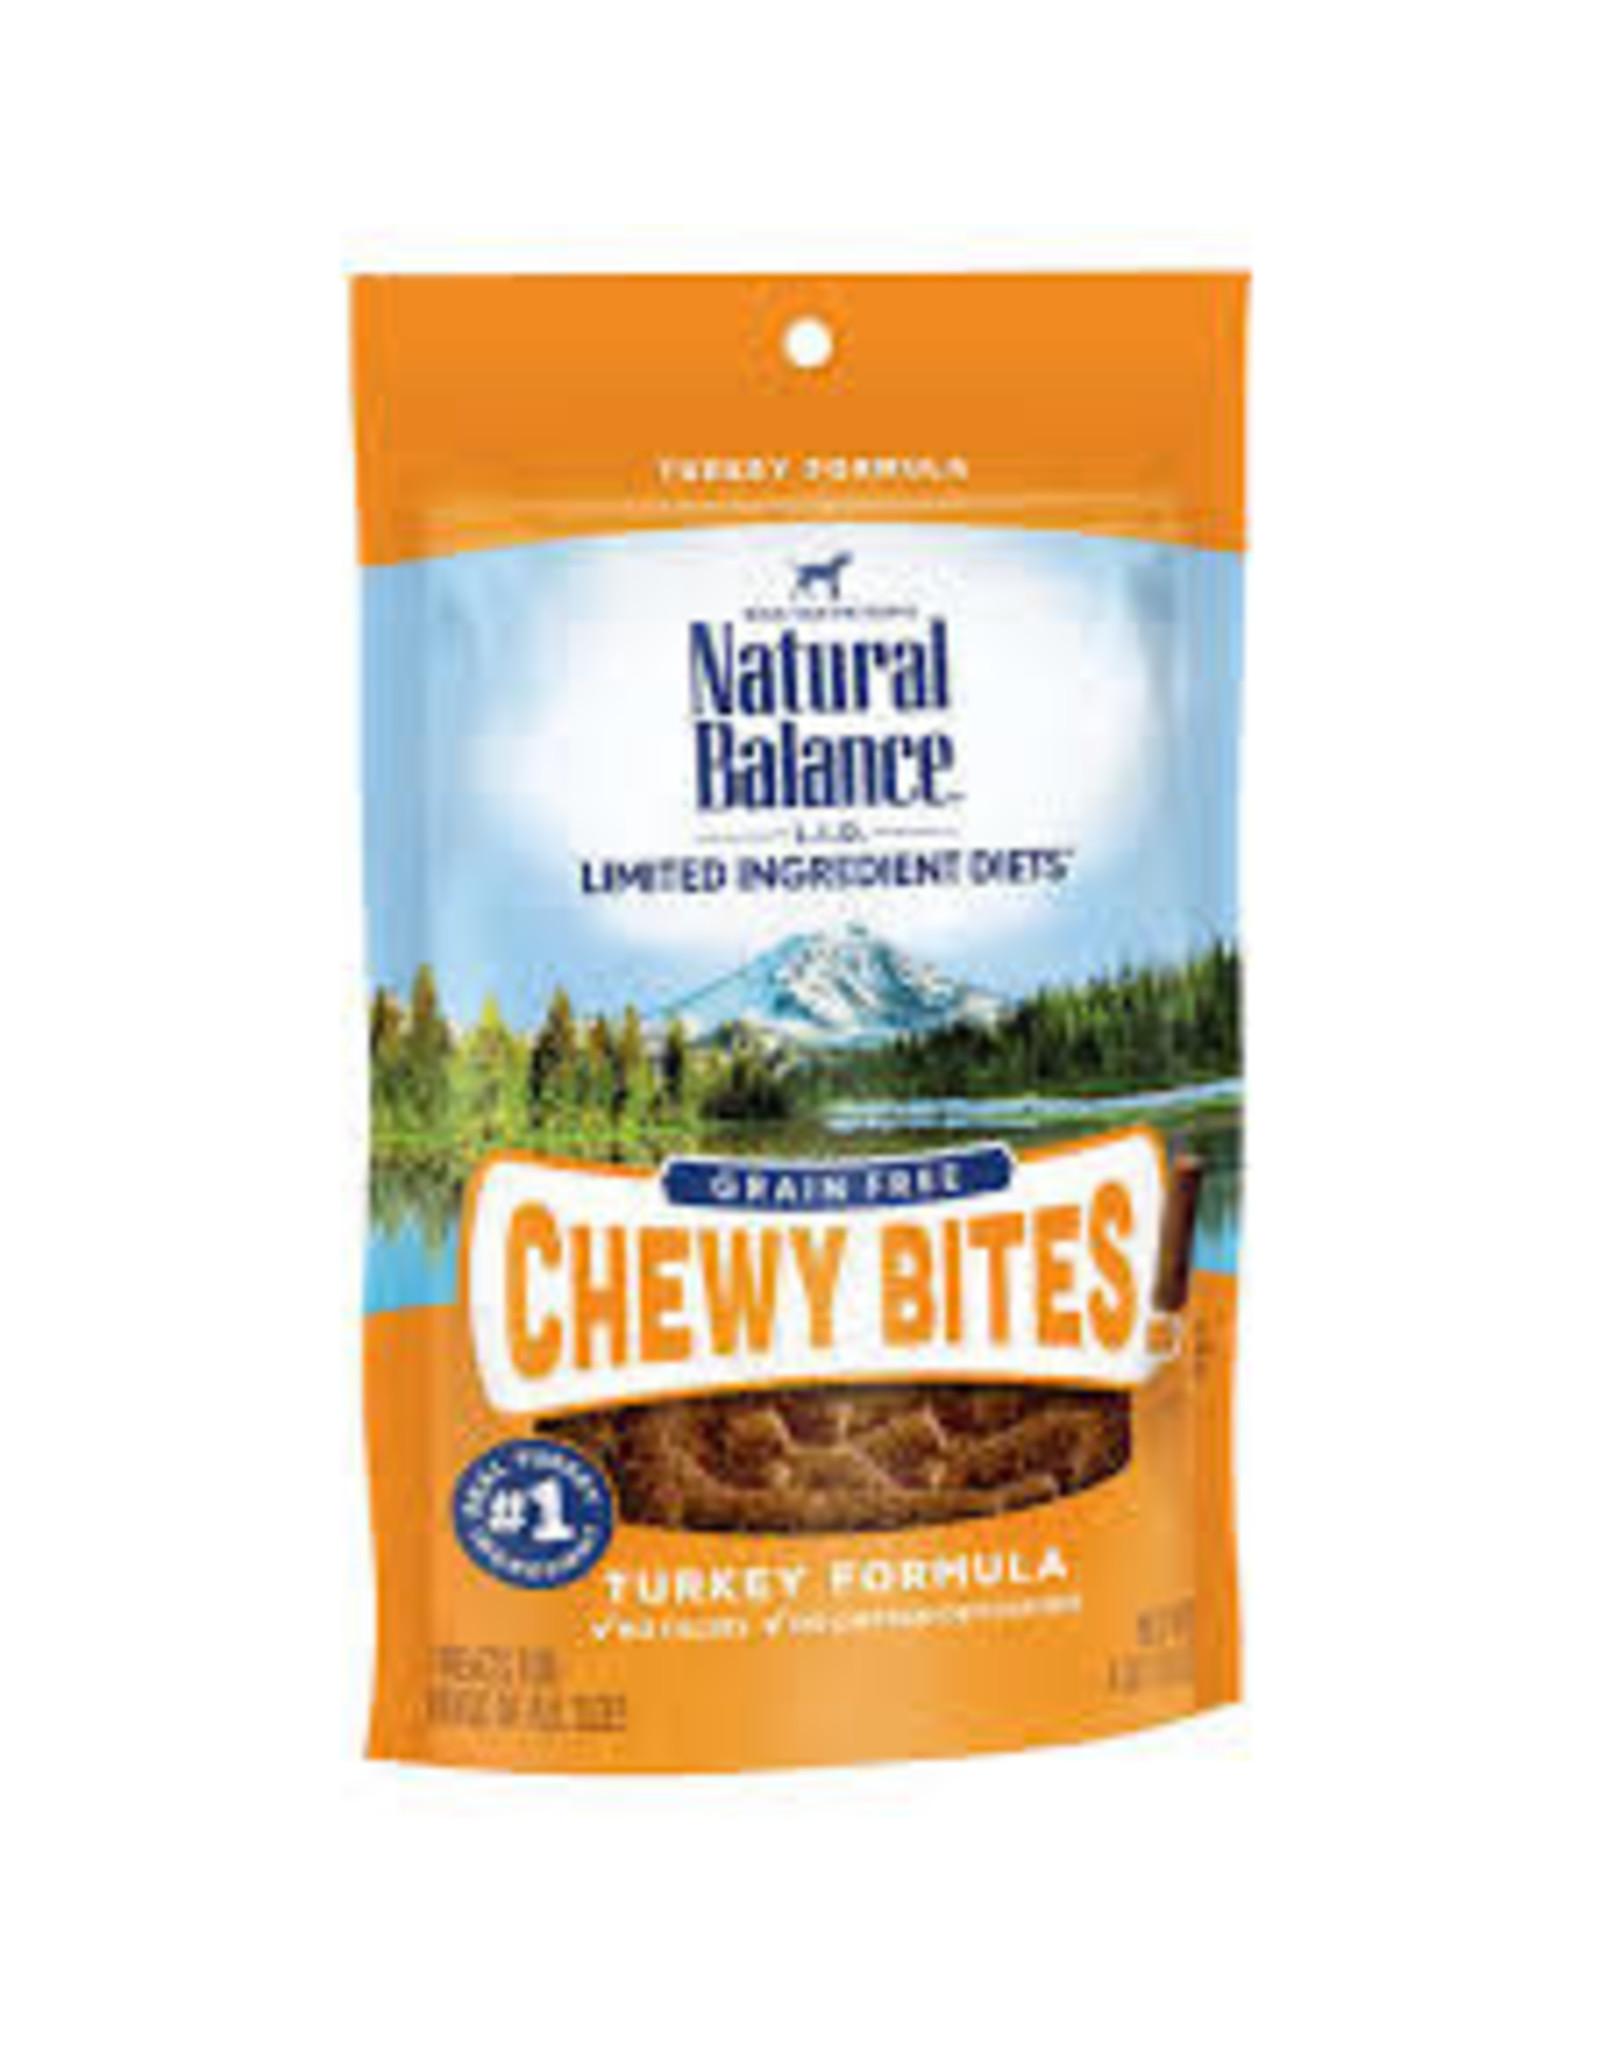 Natural Balance Natural Balance - GF Chewy Bites Turkey 4oz